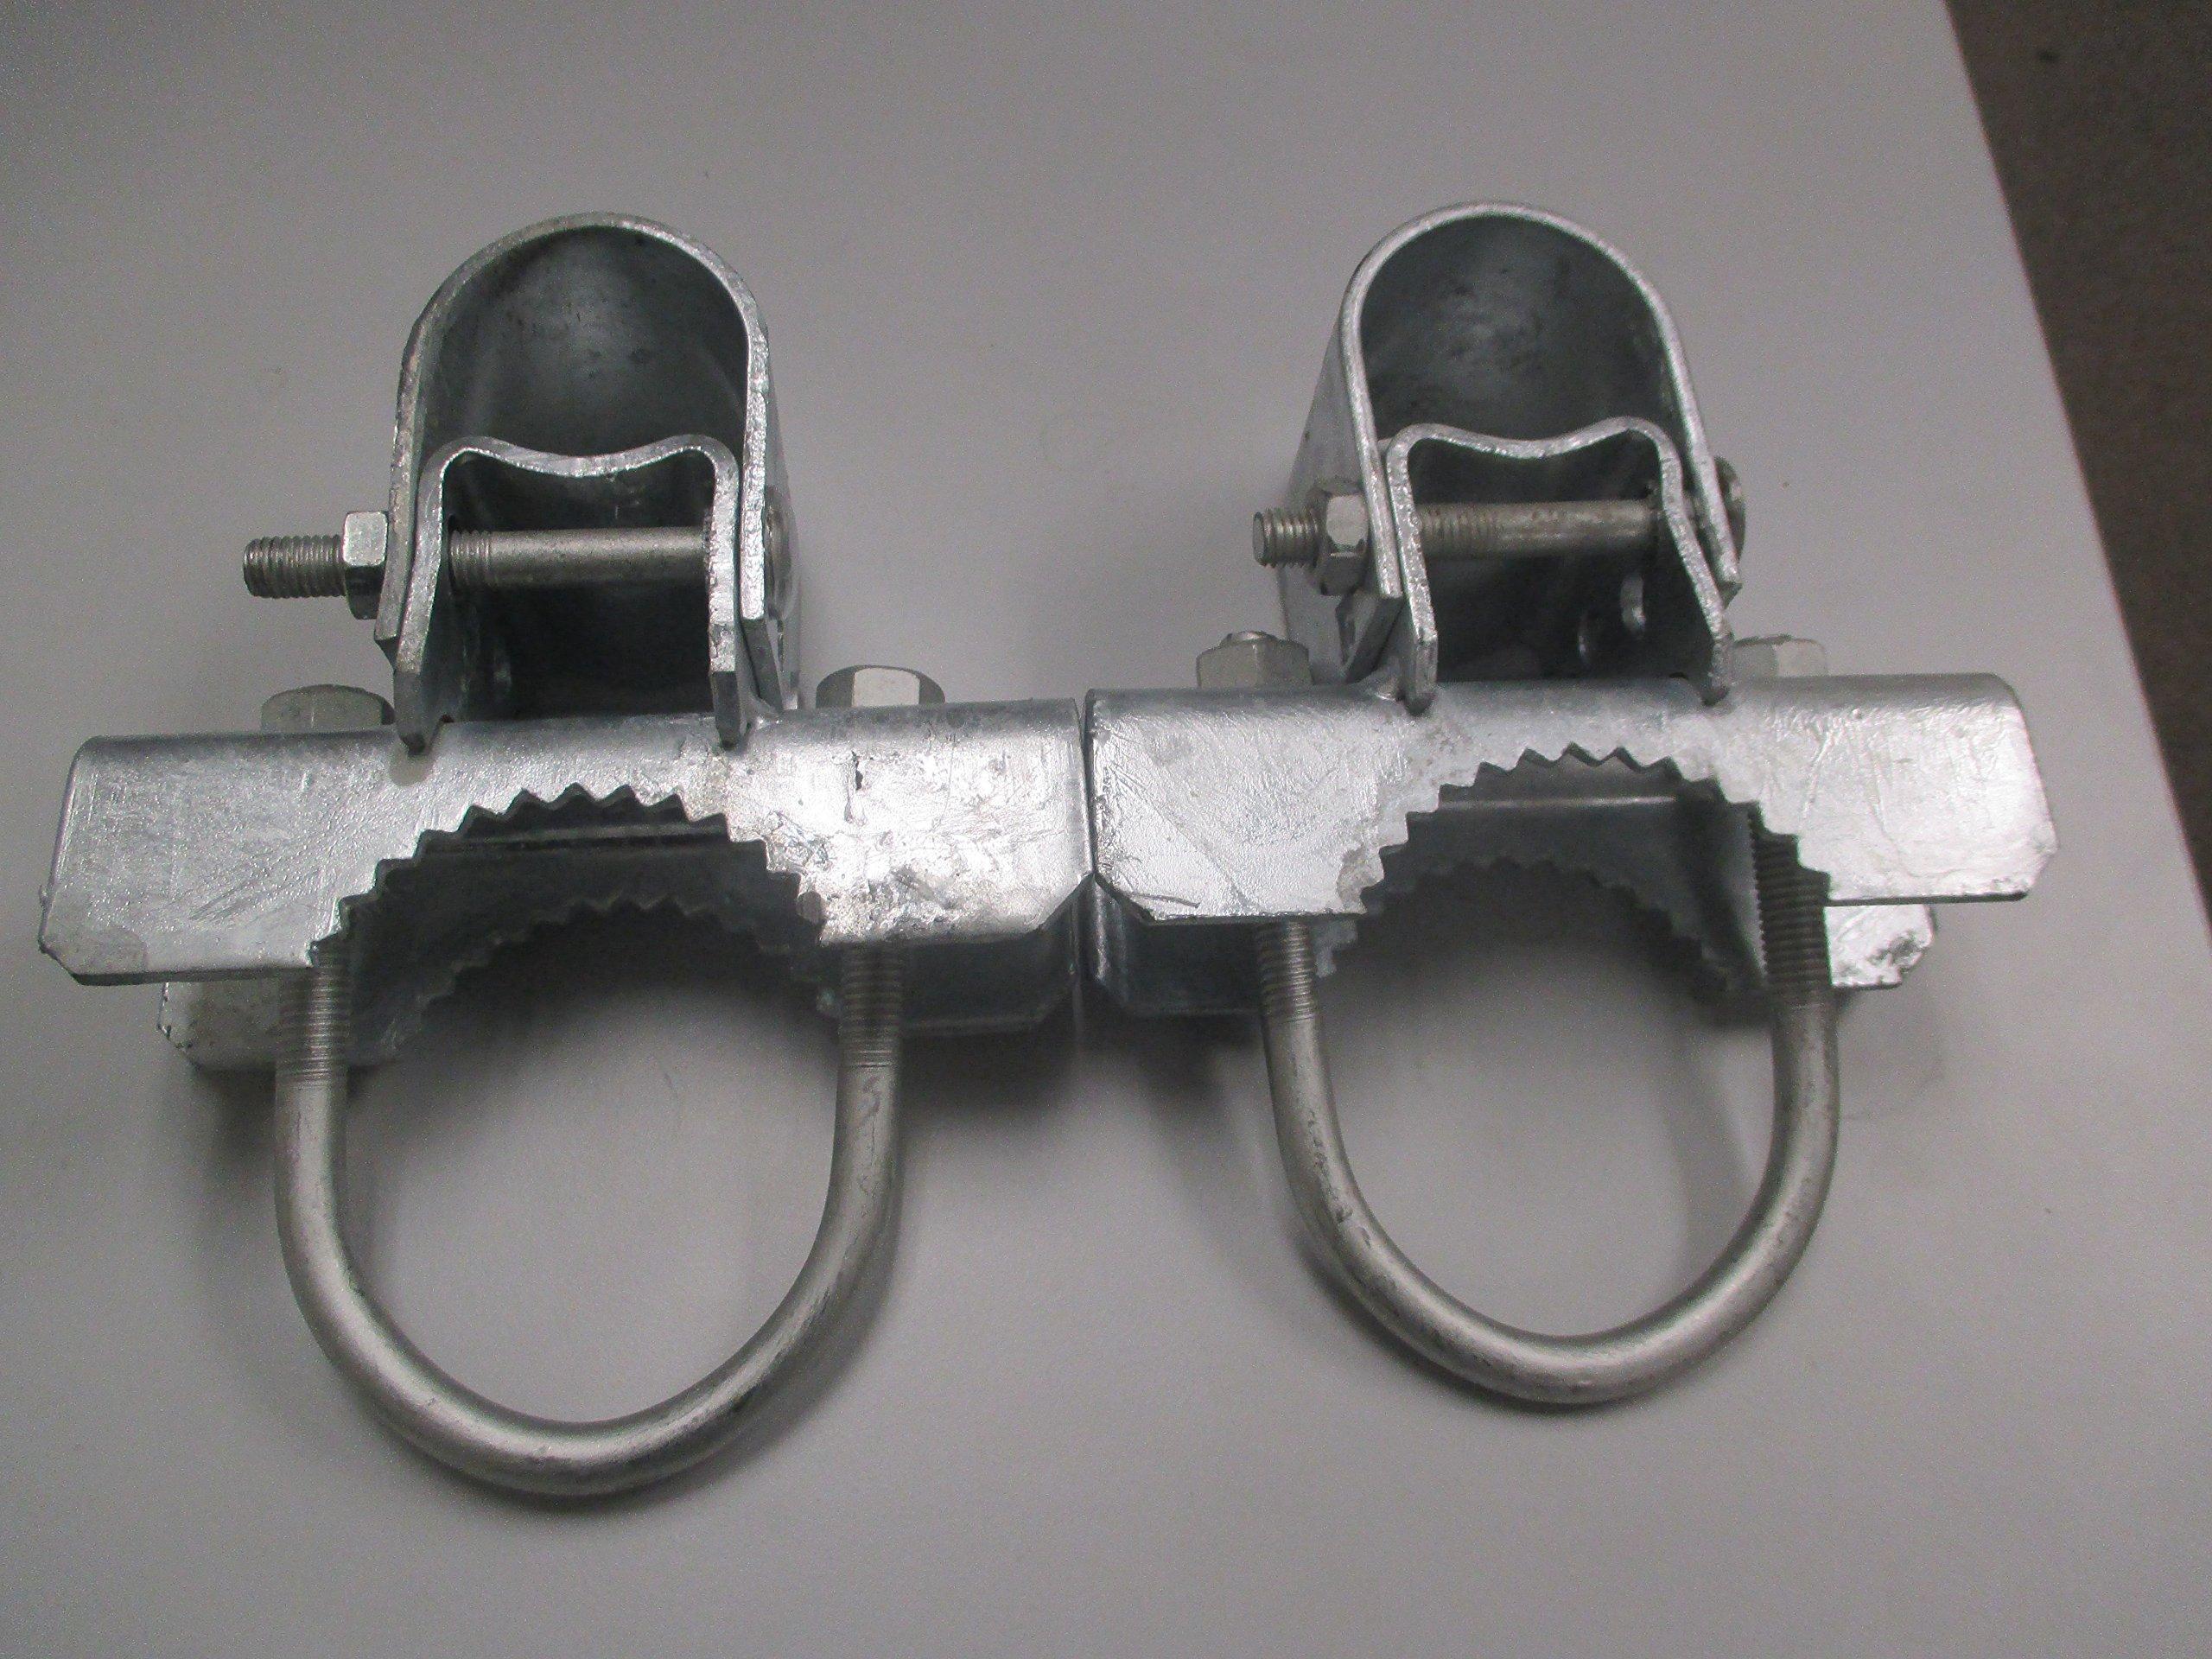 Pressed Steel Industrial Griptite Bulldog Hinge for Chain Link Gate - (2 Sets Pack) (2-7/8'')